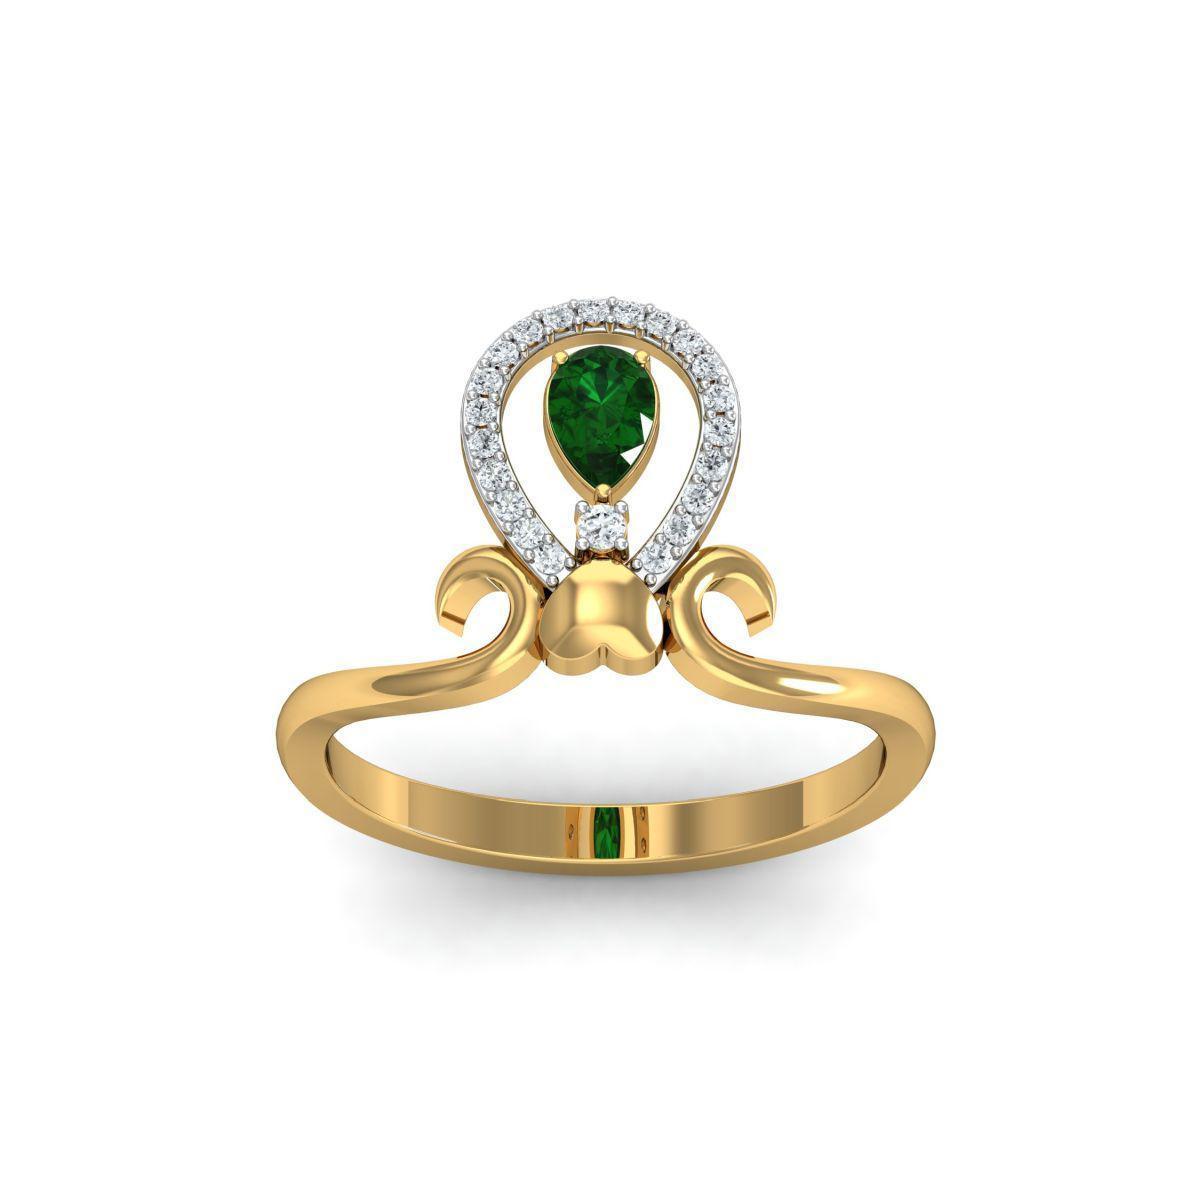 Diamoire Jewels 18kt Yellow Gold Pave 0.14ct Diamond Infinity Ring I - UK G 1/4 - US 3 1/2 - EU 45 3/4 GYN8Z